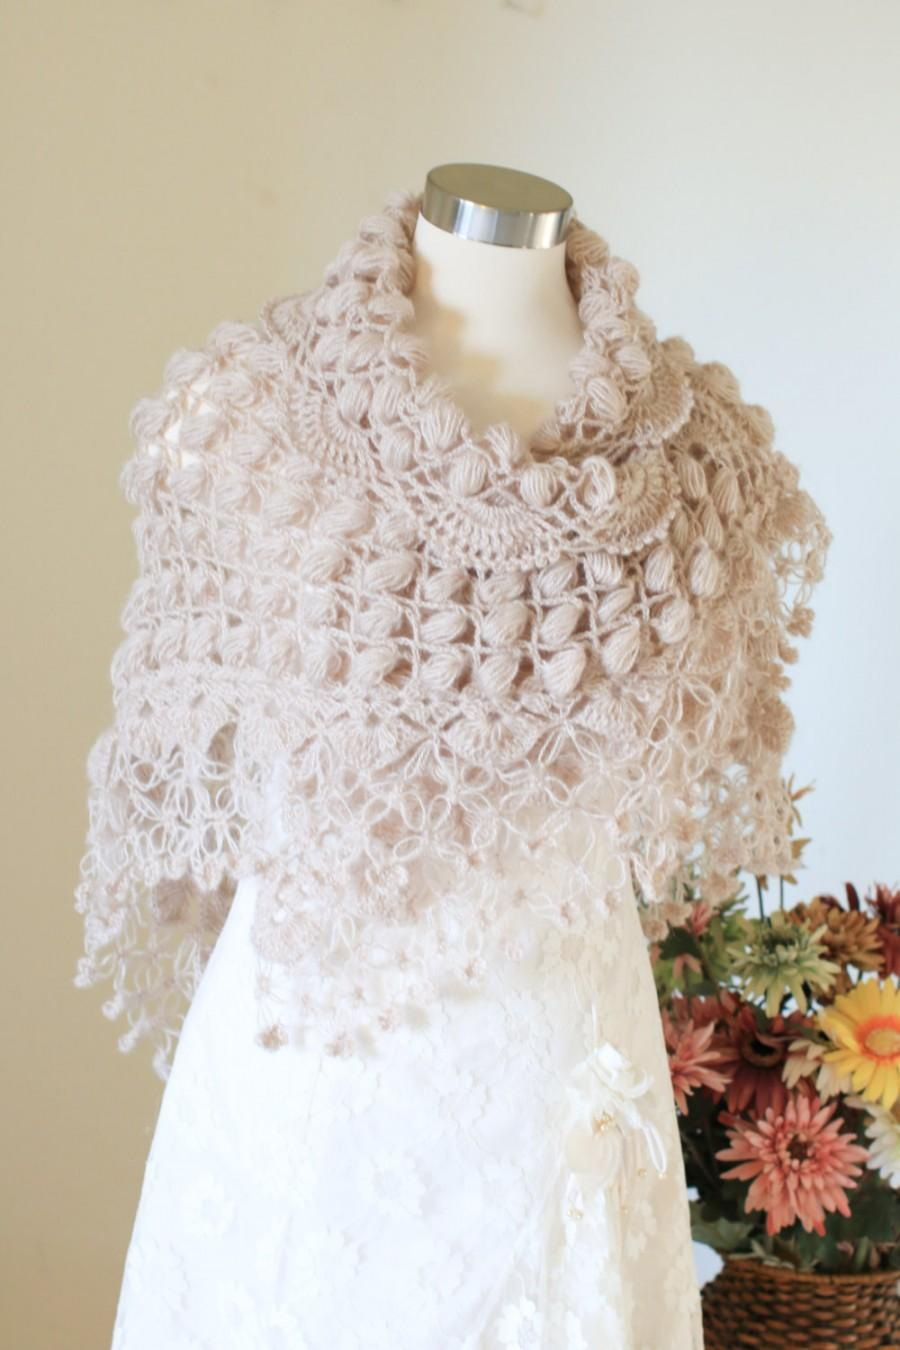 Свадьба - Winter Wedding,Crochet Shawl, Beige Shawl, Shawl, Bridal Cape, Wedding Cape, Bridal Wrap, Bridal Bolero, Wedding Shawl, Bridal Shawl, Cape